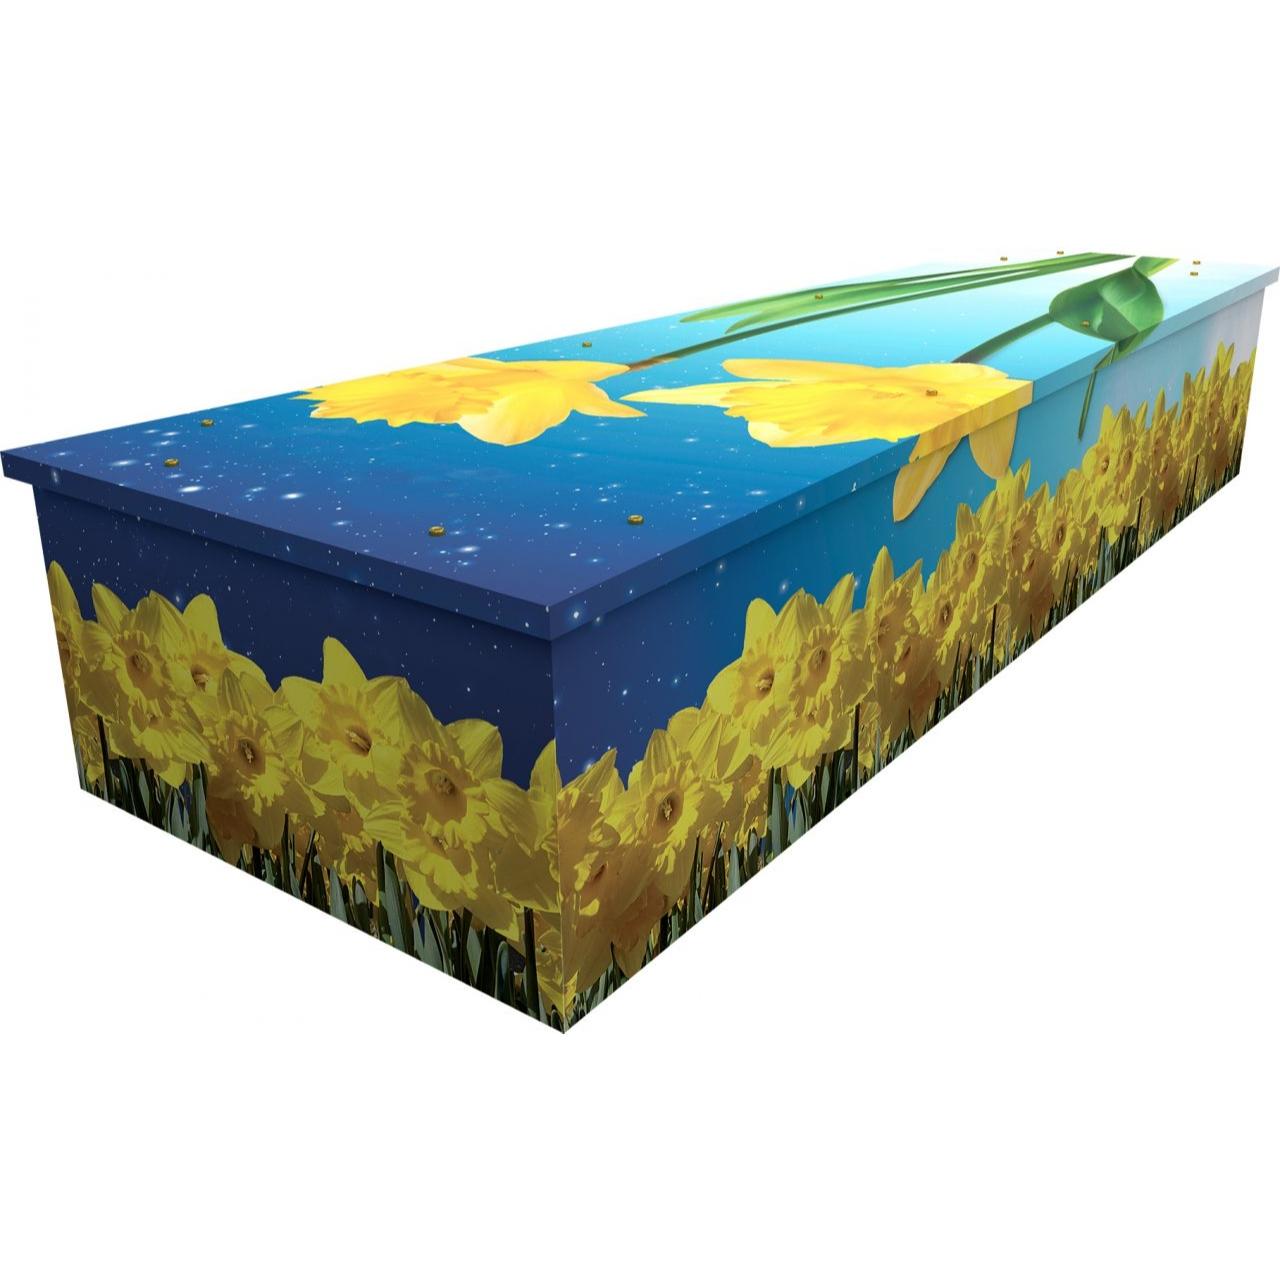 Daffodils Cardboard Coffin